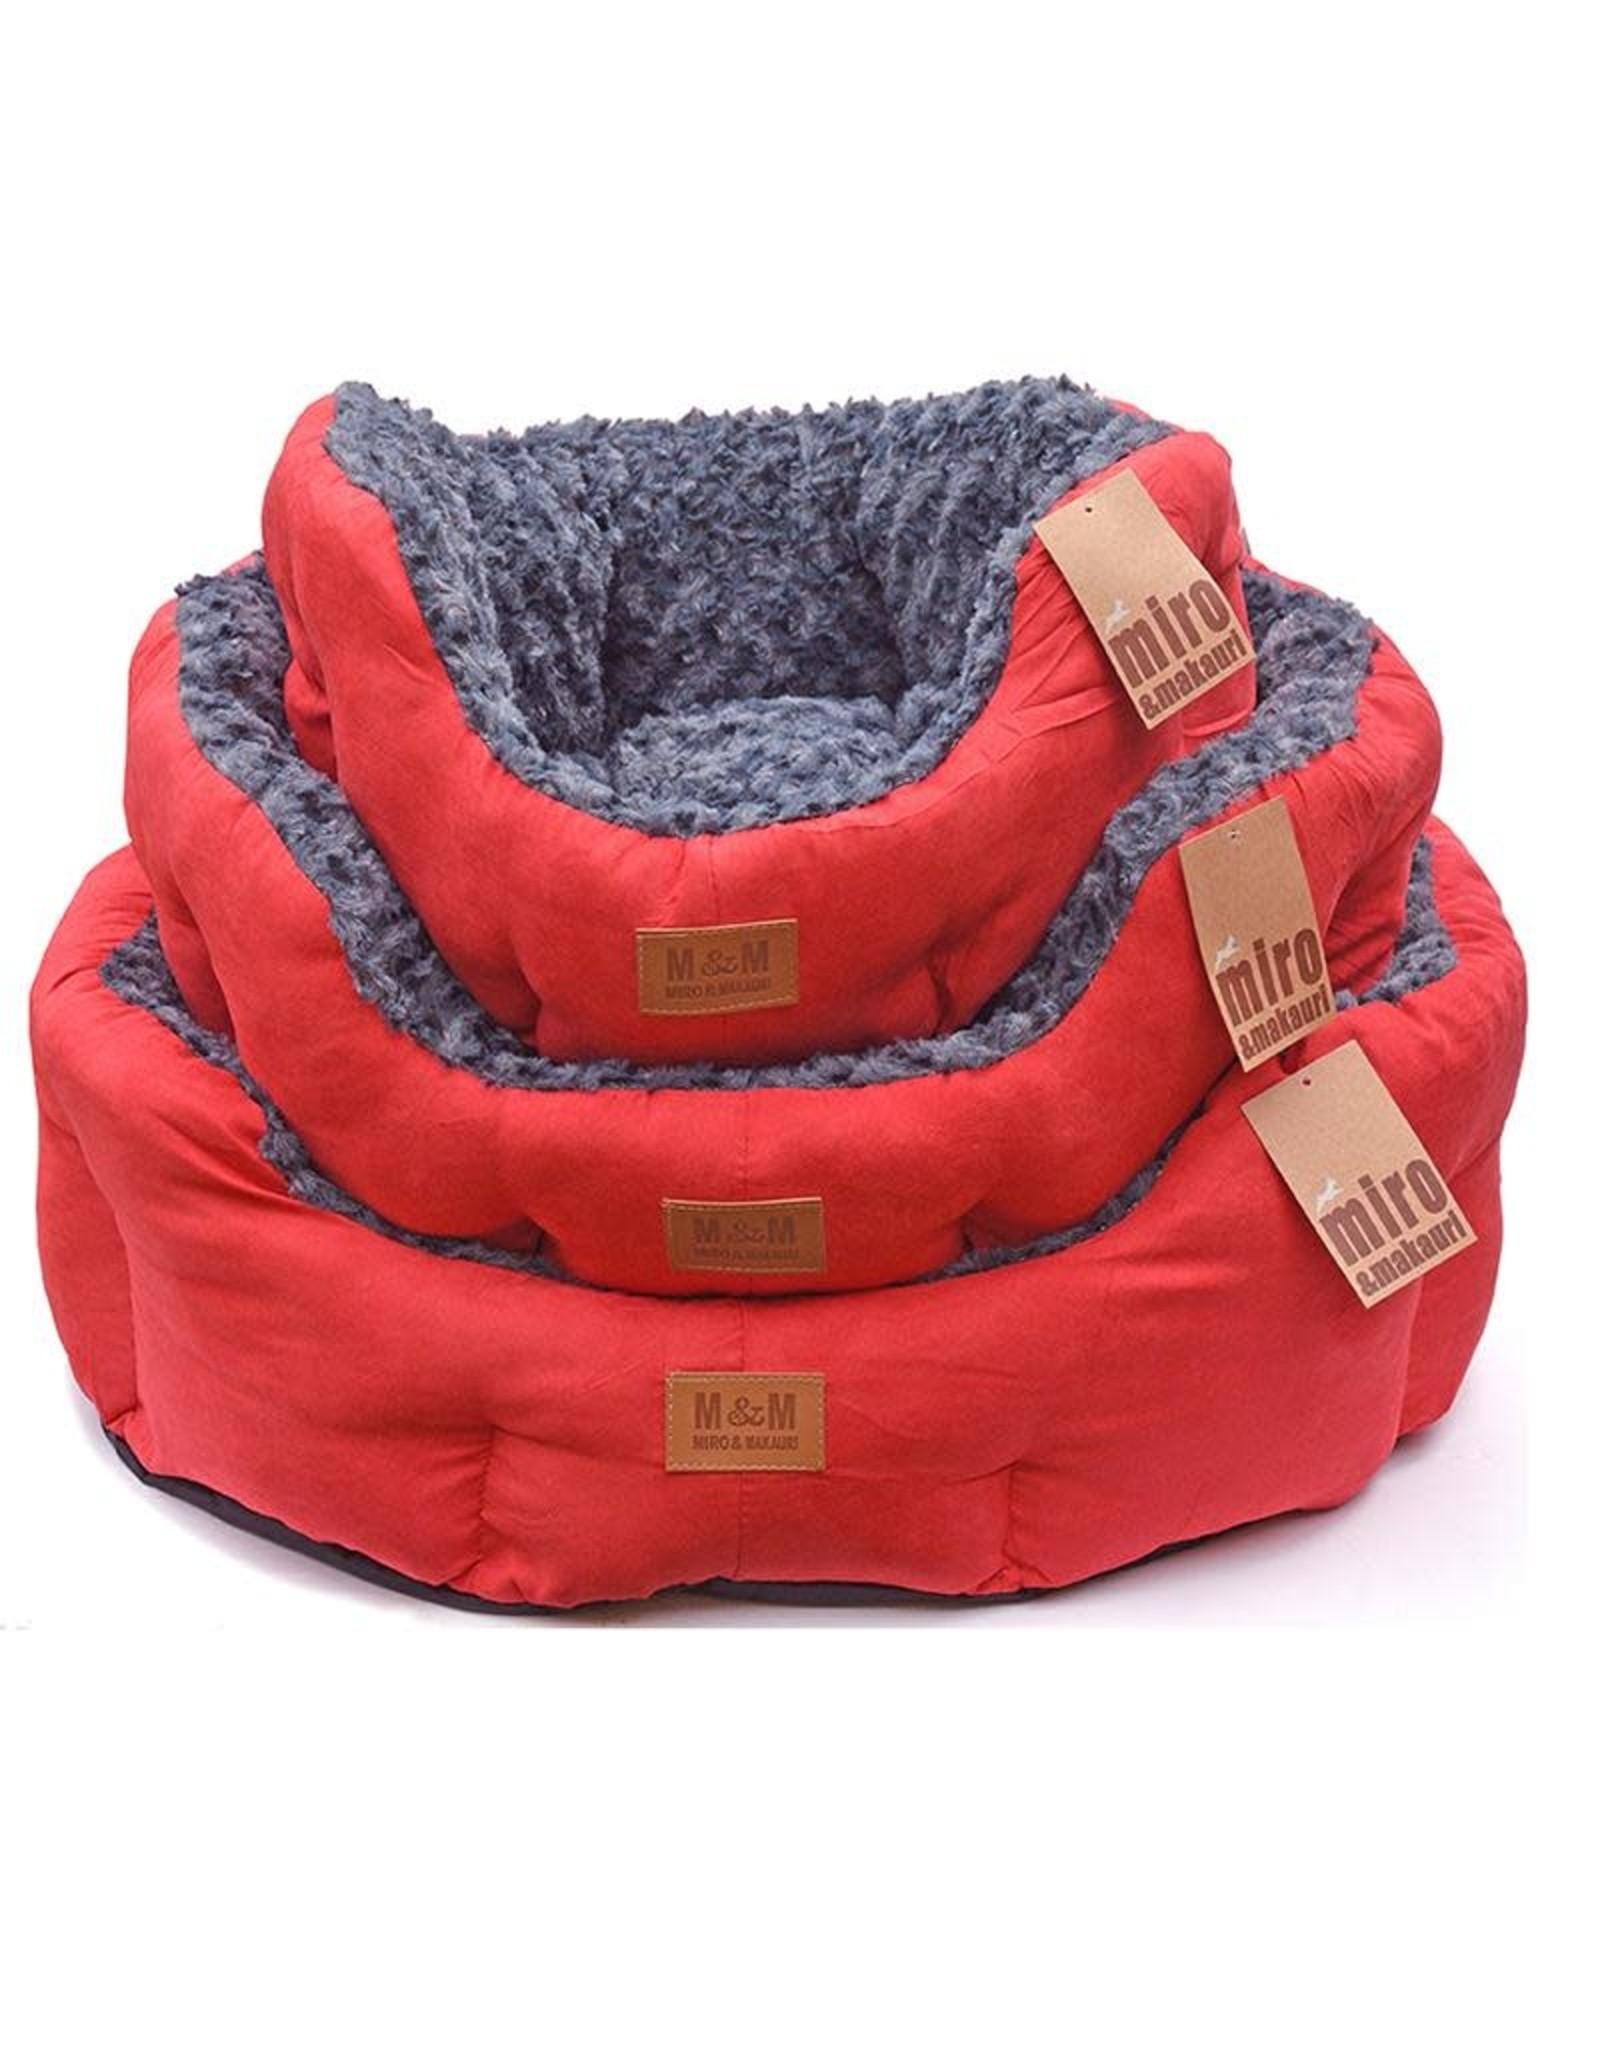 Miro Makauri Makauri Faux Suede Dog Bed Red/Grey 55cm